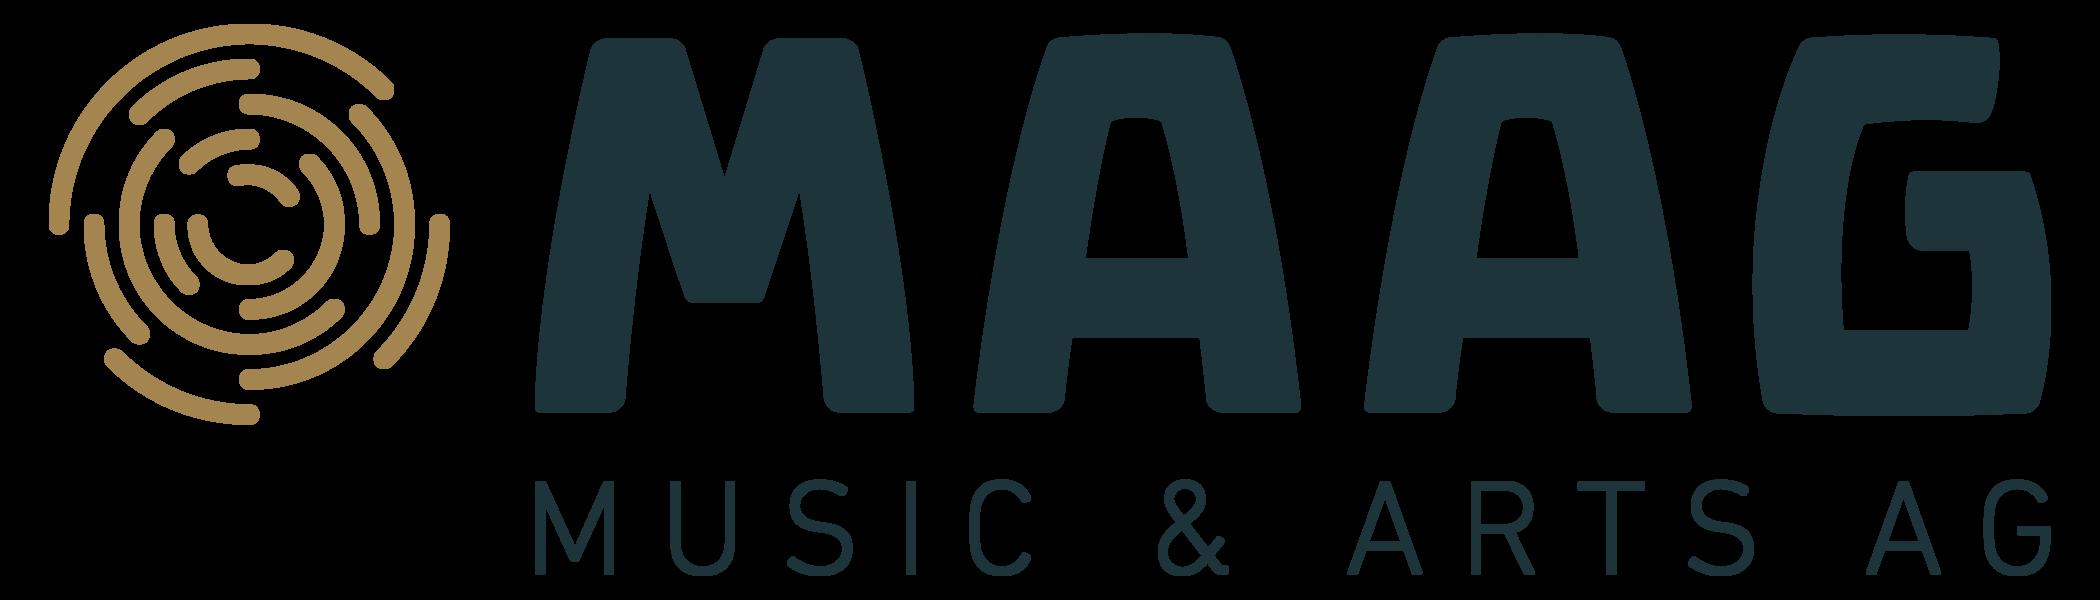 MAAG Music & Arts AG